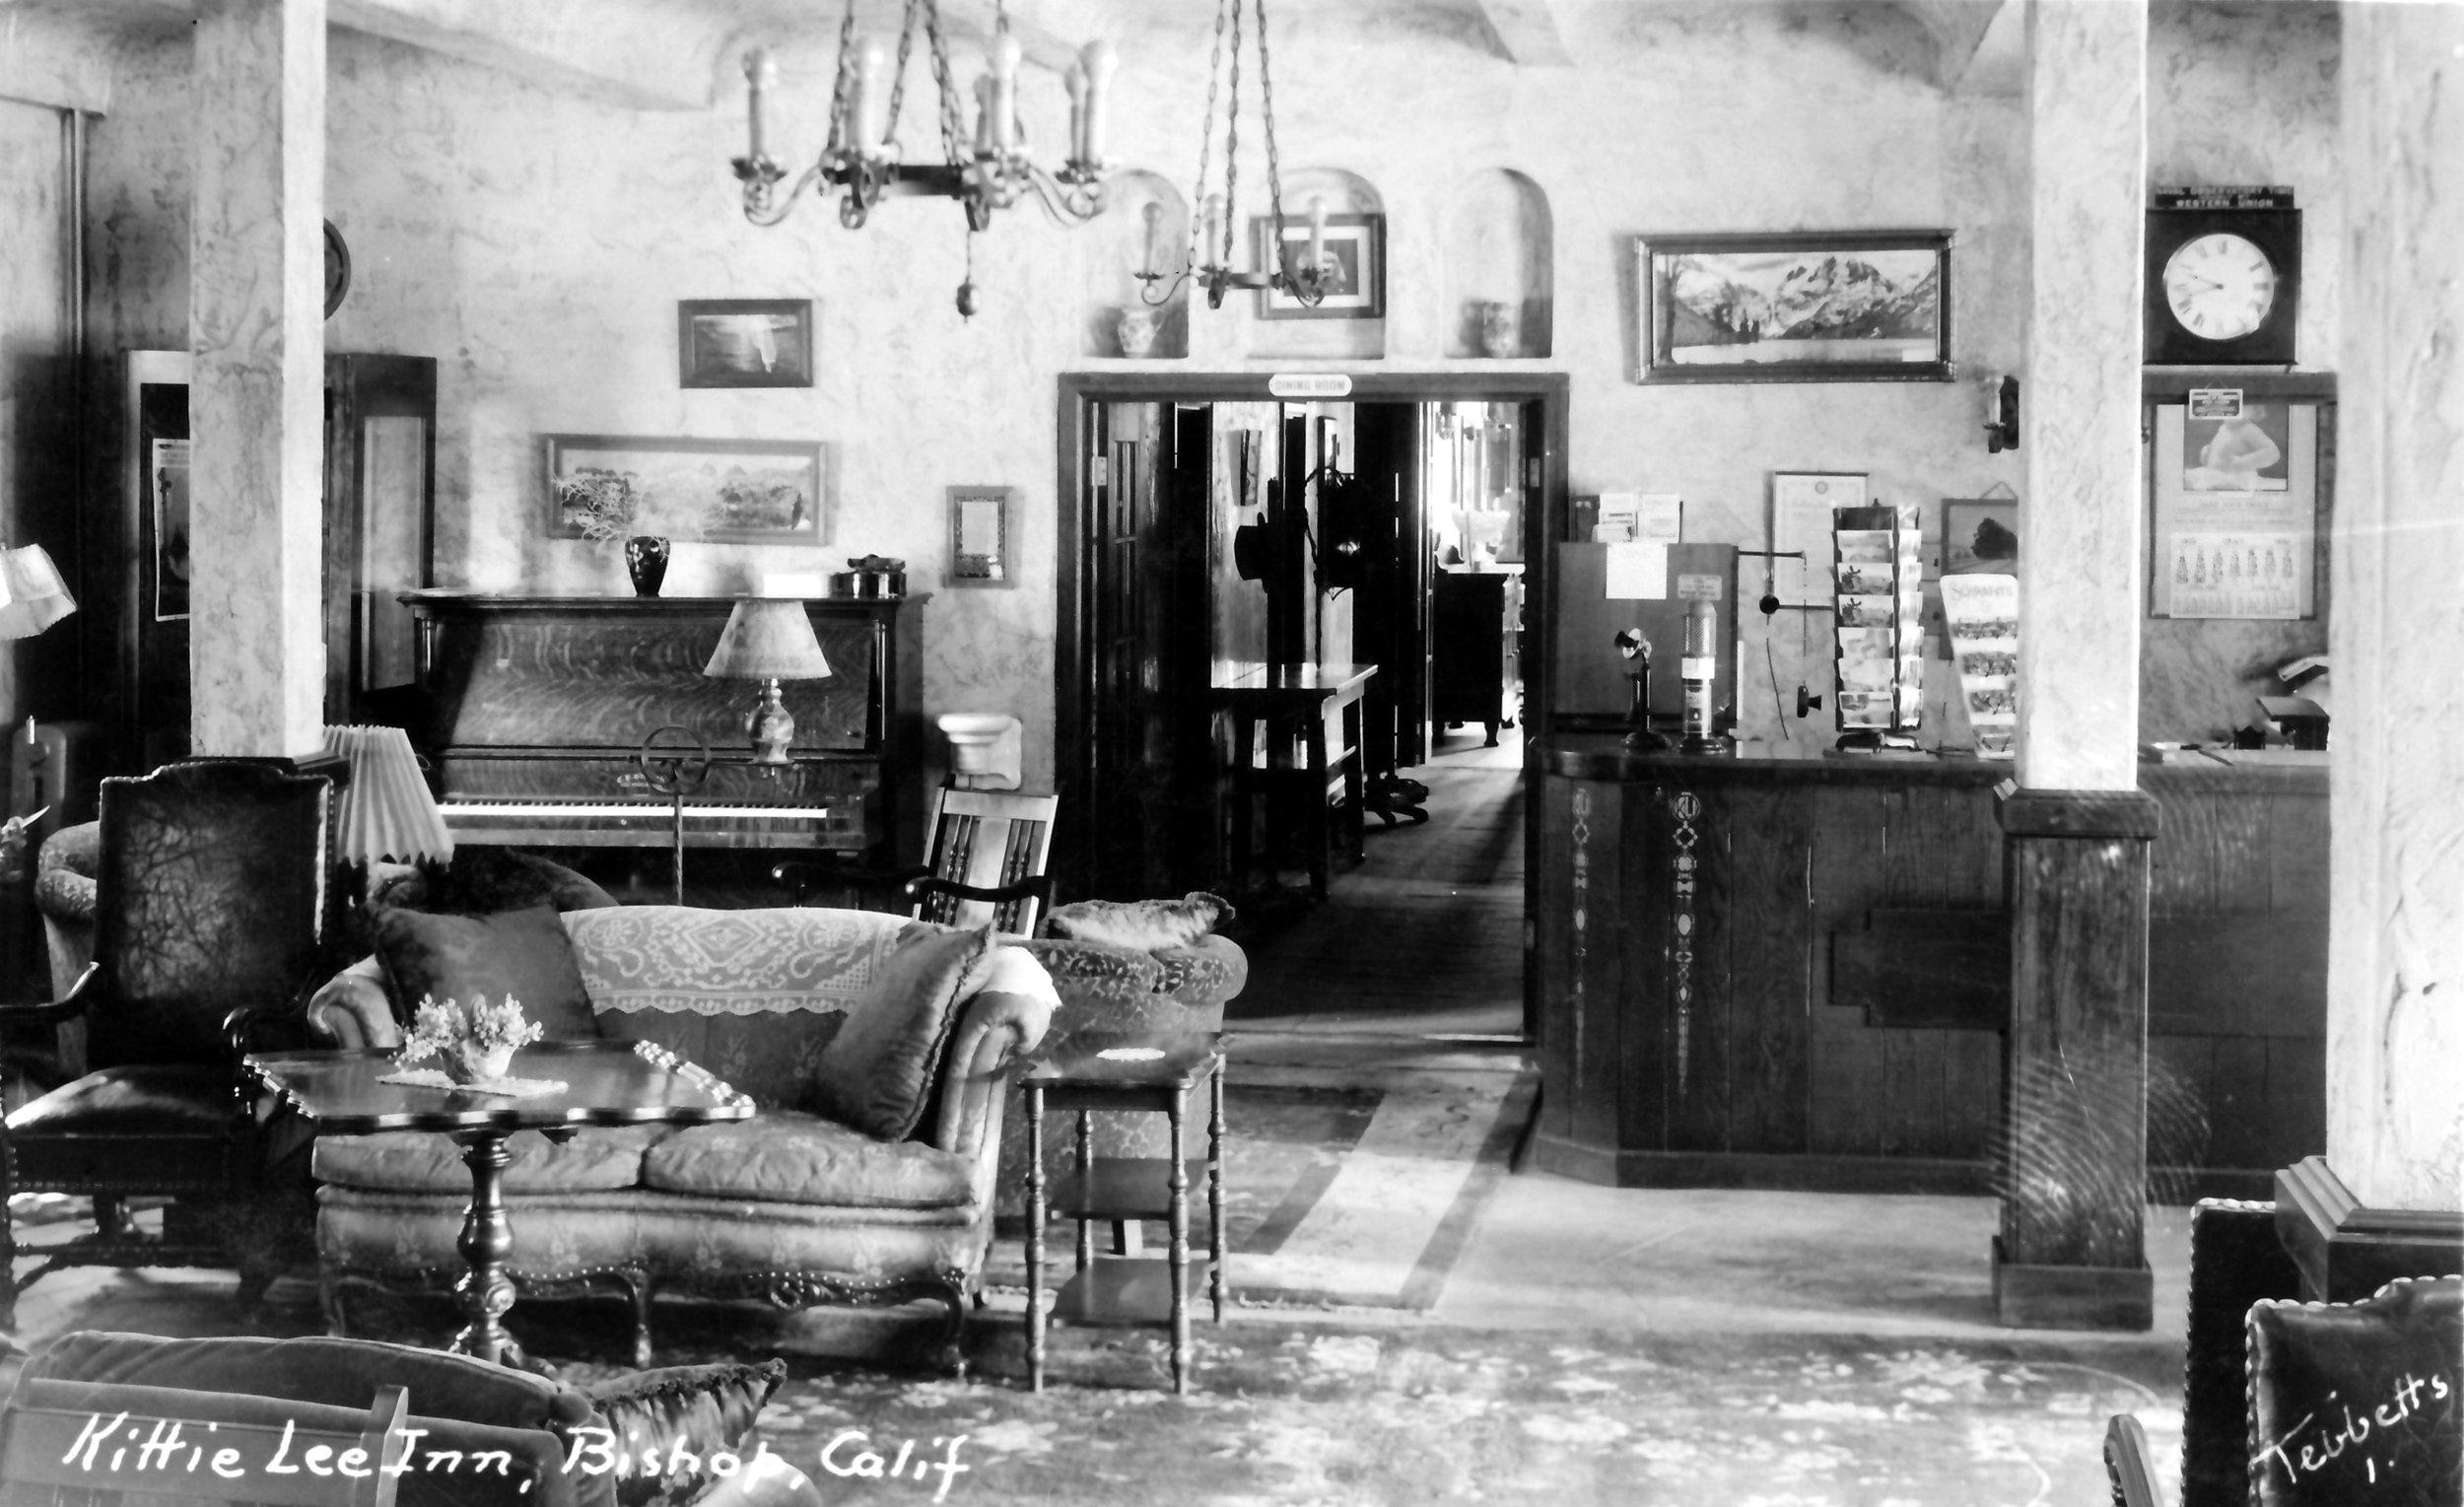 BUR 1--Kittie Lee Inn, Interior Lobby.jpg